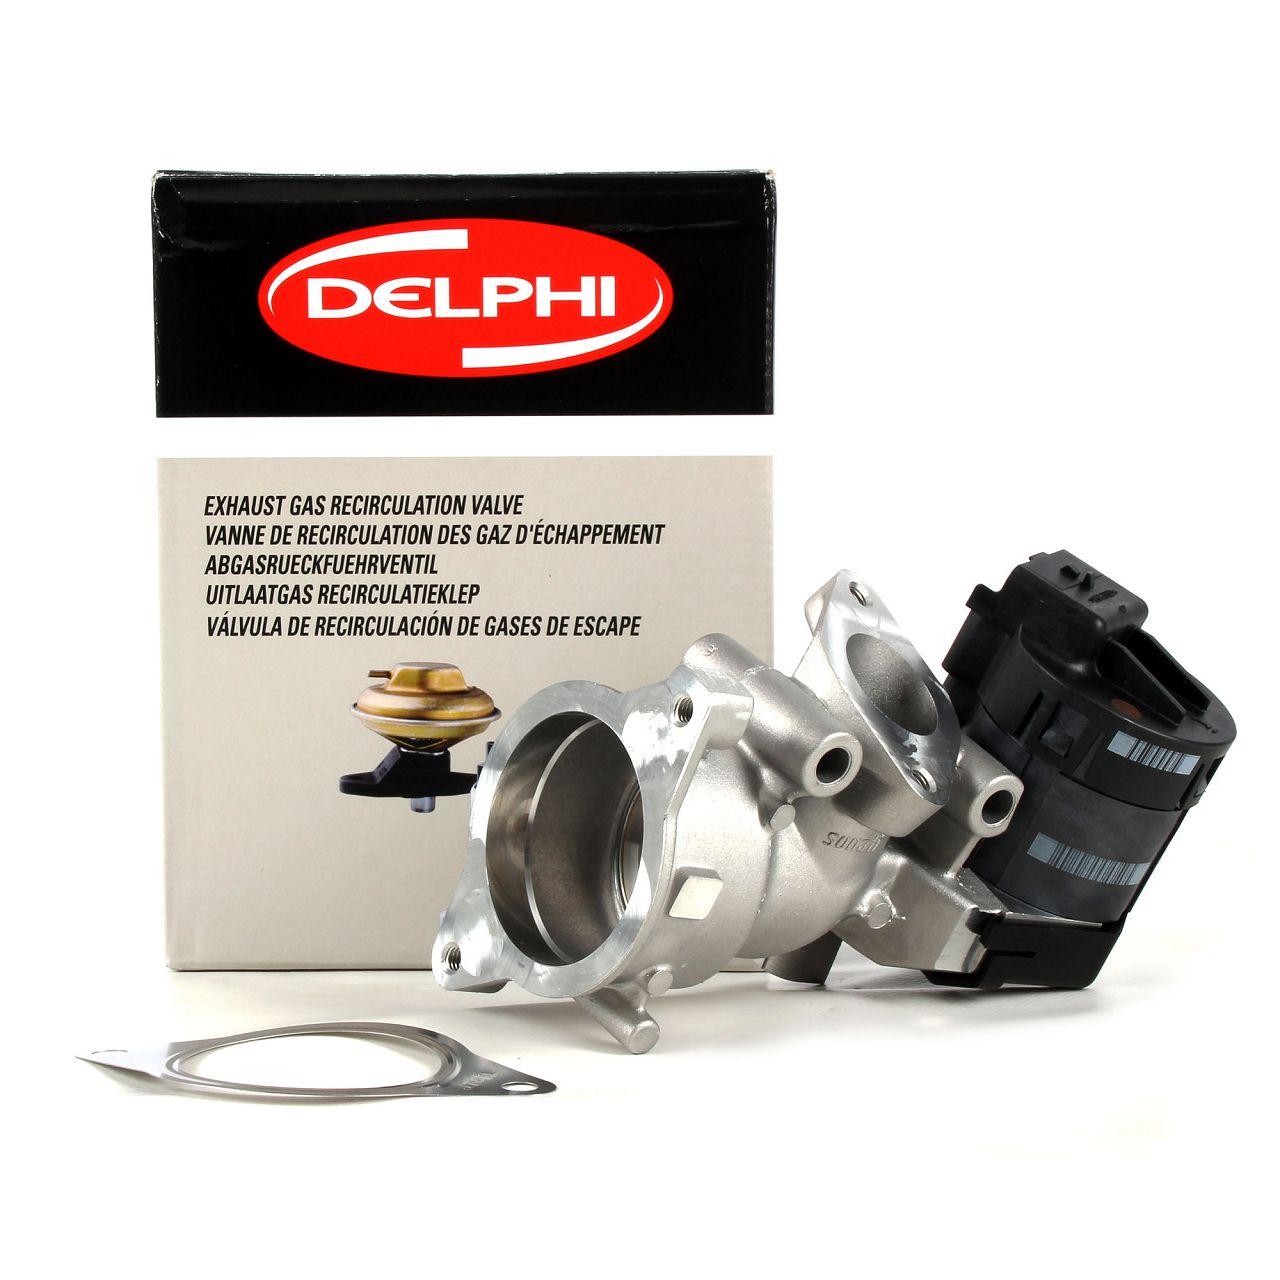 DELPHI AGR Ventil für FORD C-MAX FOCUS GALAXY KUGA MONDEO S-MAX 2.0 TDCi